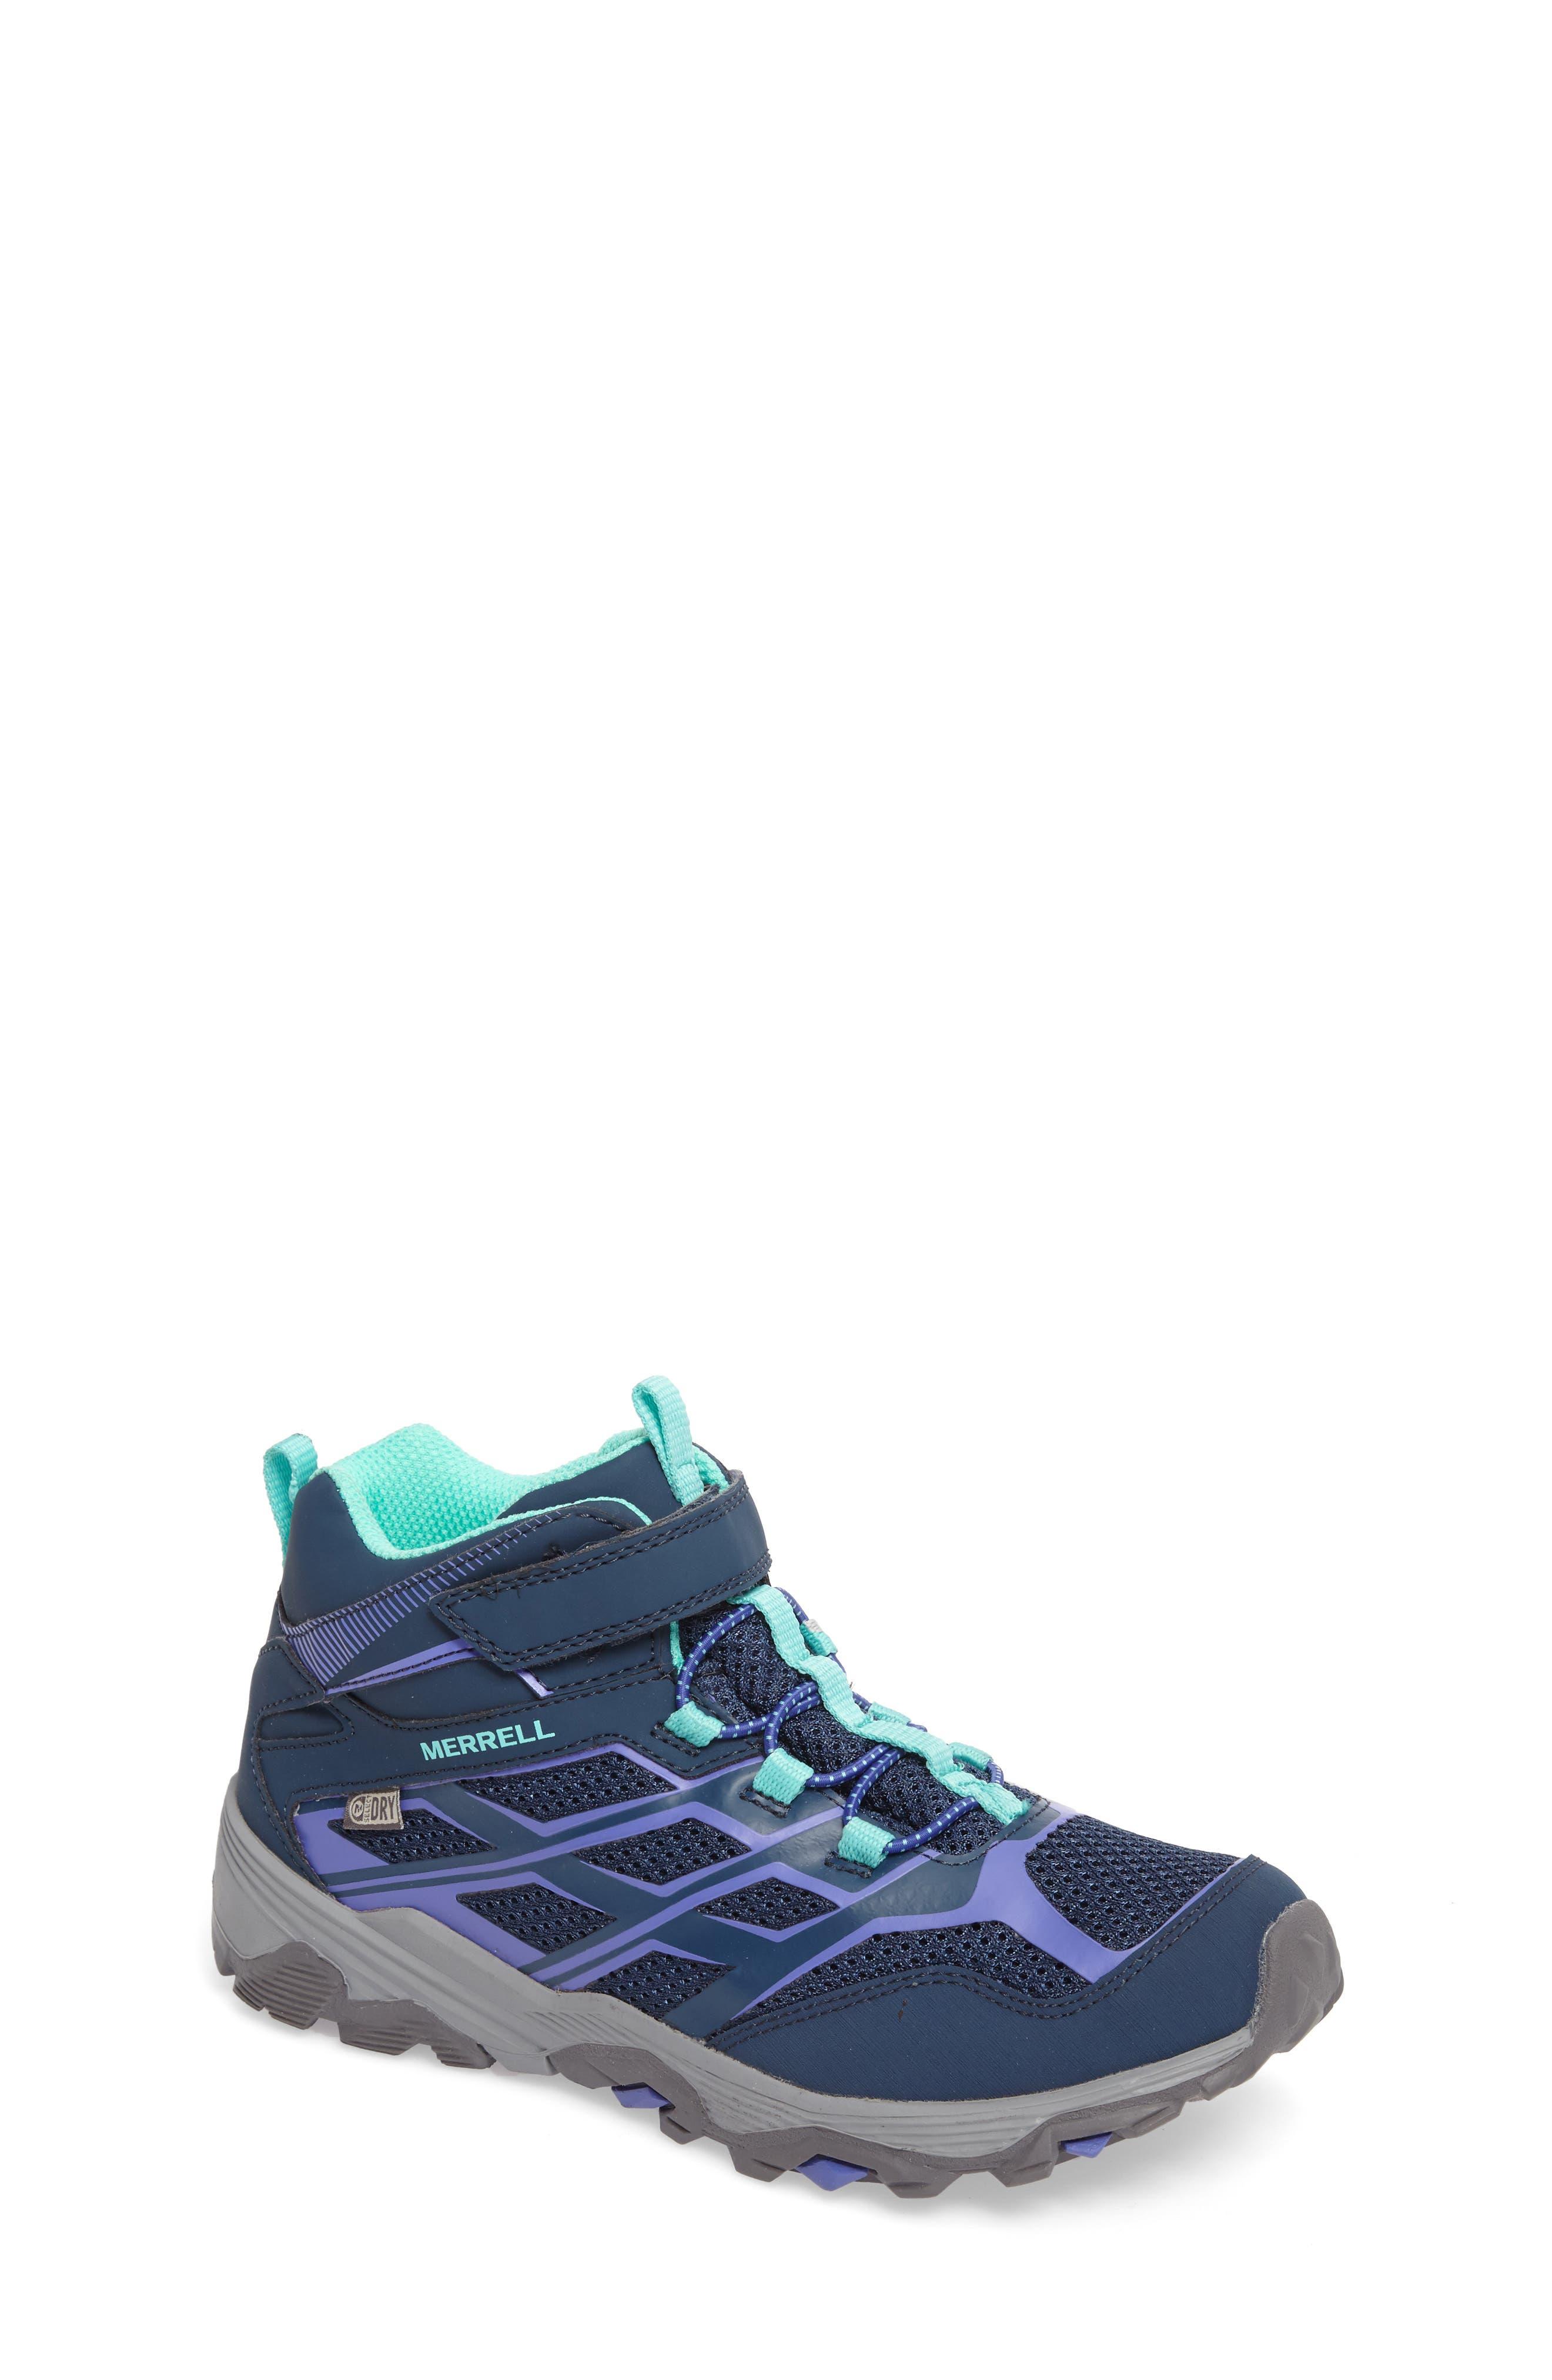 Alternate Image 1 Selected - Merrell Moab FST Polar Mid Insulated Waterproof Sneaker Boot (Baby, Walker, Toddler, Little Kid & Big Kid)